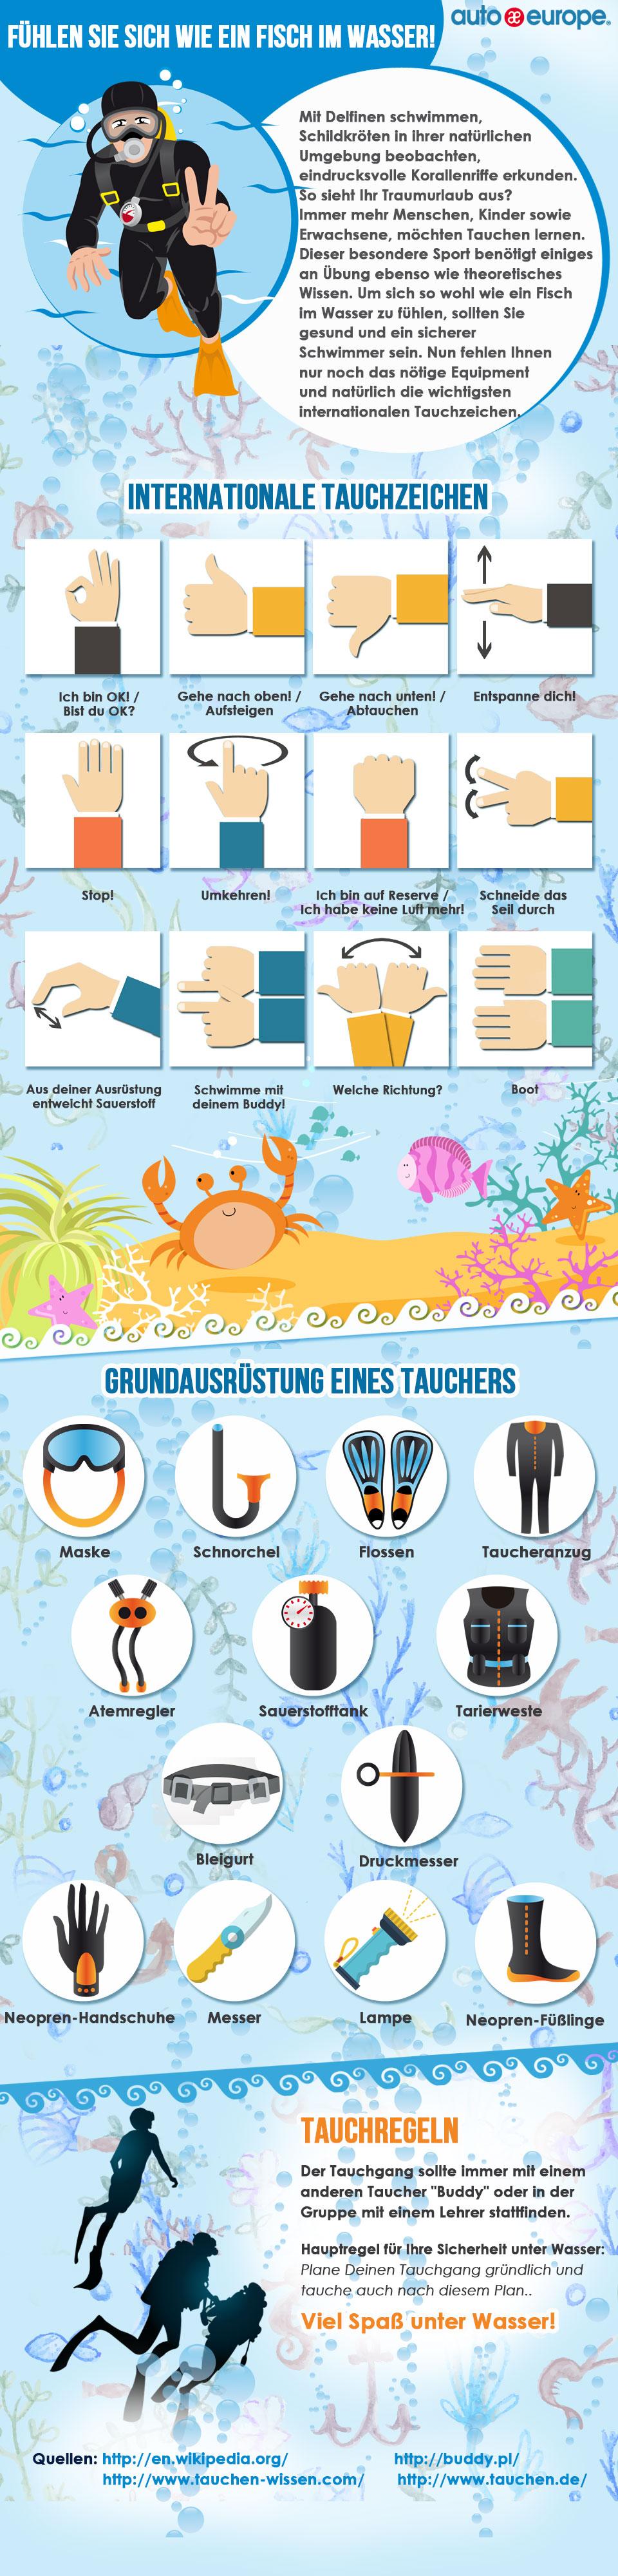 Infographic - Tauchurlaub